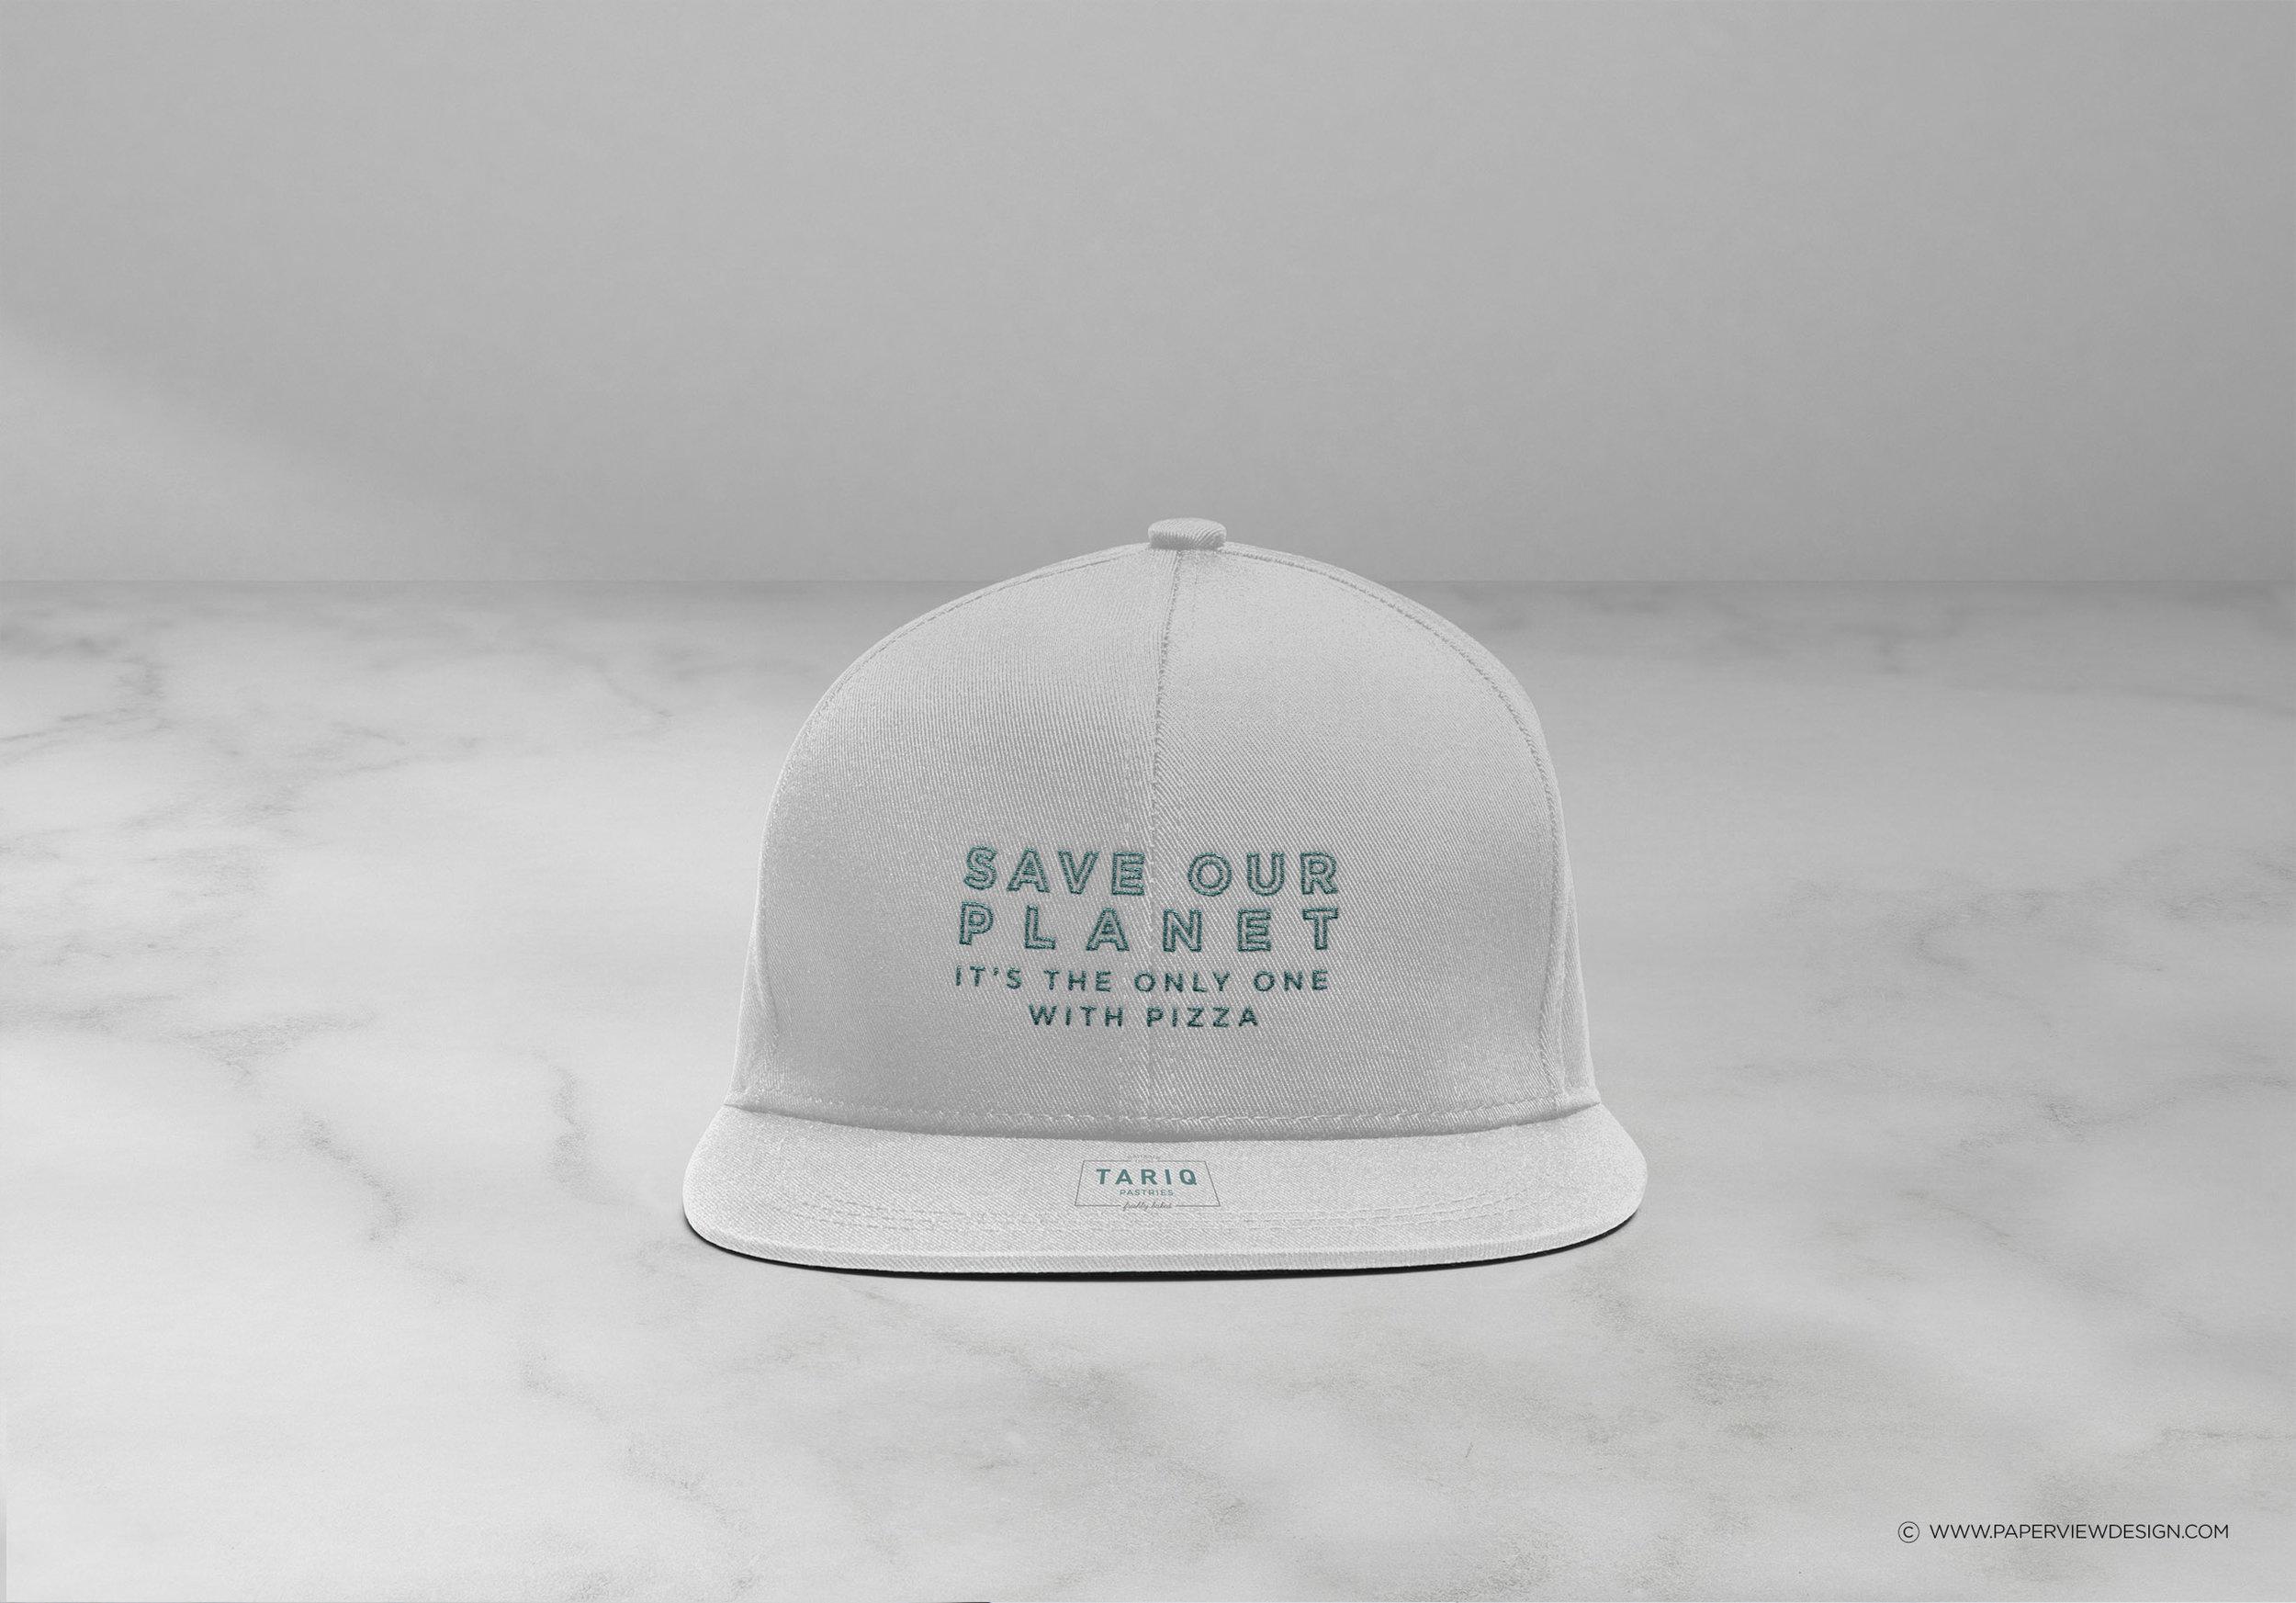 Tariq-Pastries-Hat-Identity-Branding-Bahrain